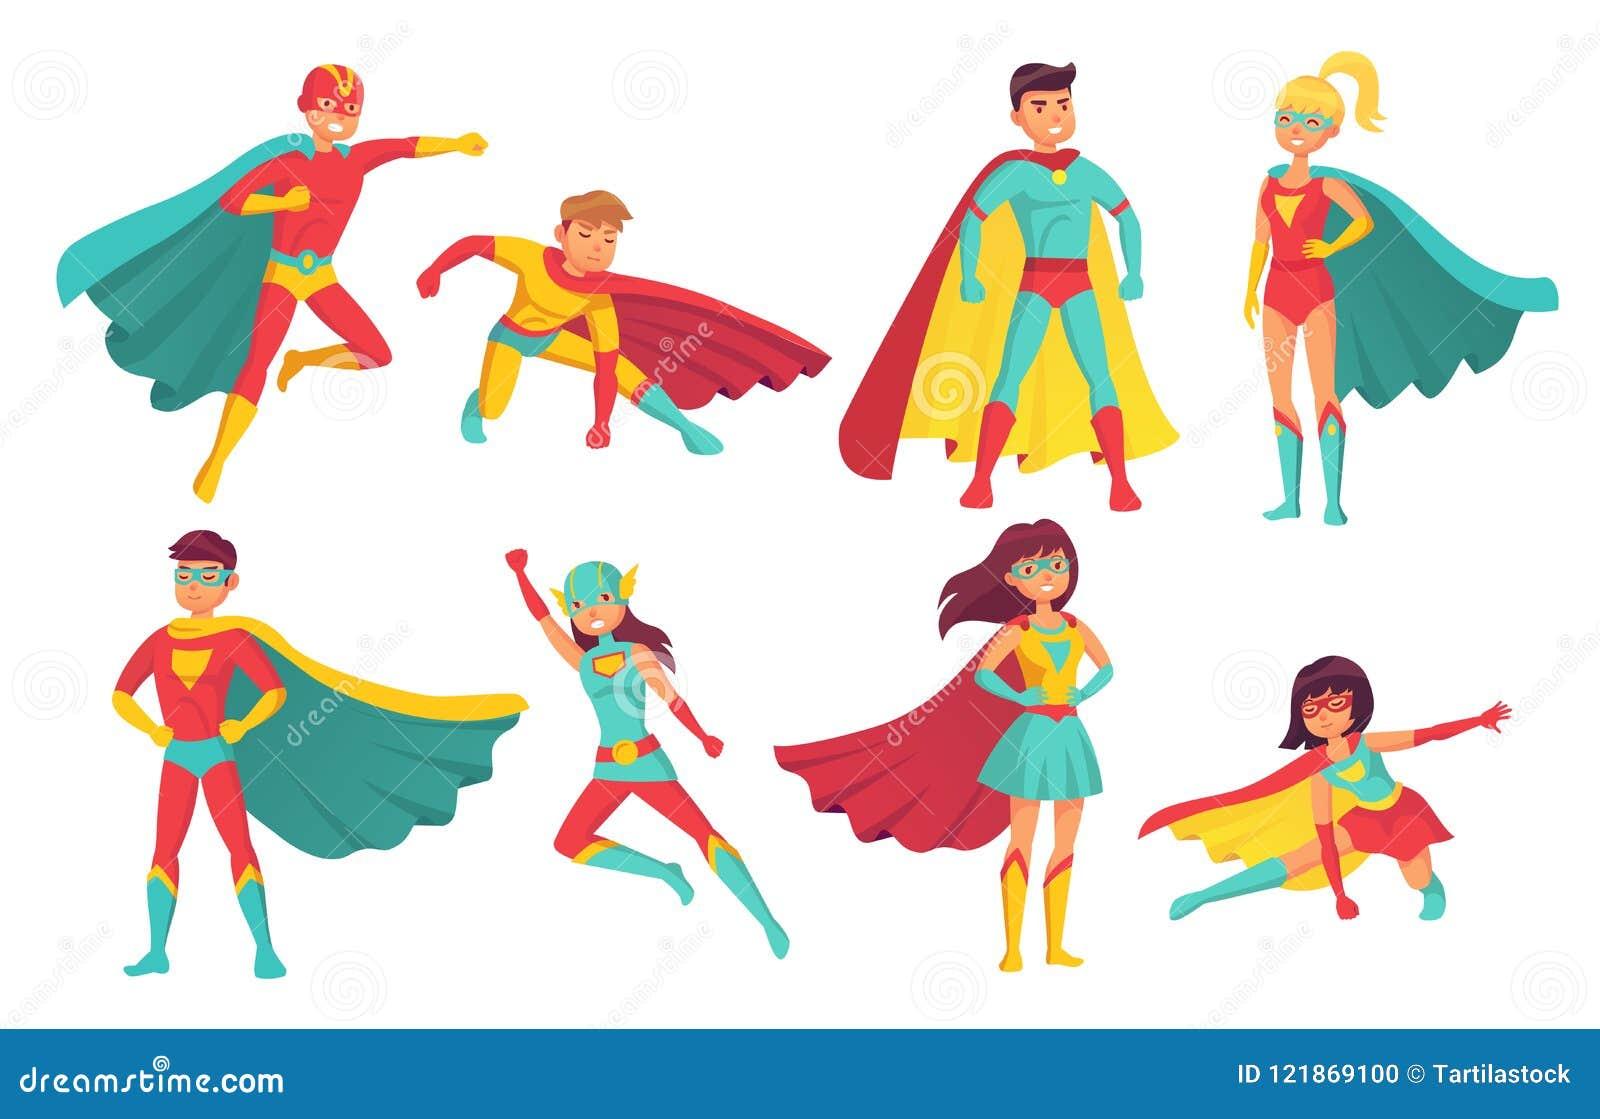 Cartoon Superhero Stock Illustrations 56 638 Cartoon Superhero Stock Illustrations Vectors Clipart Dreamstime